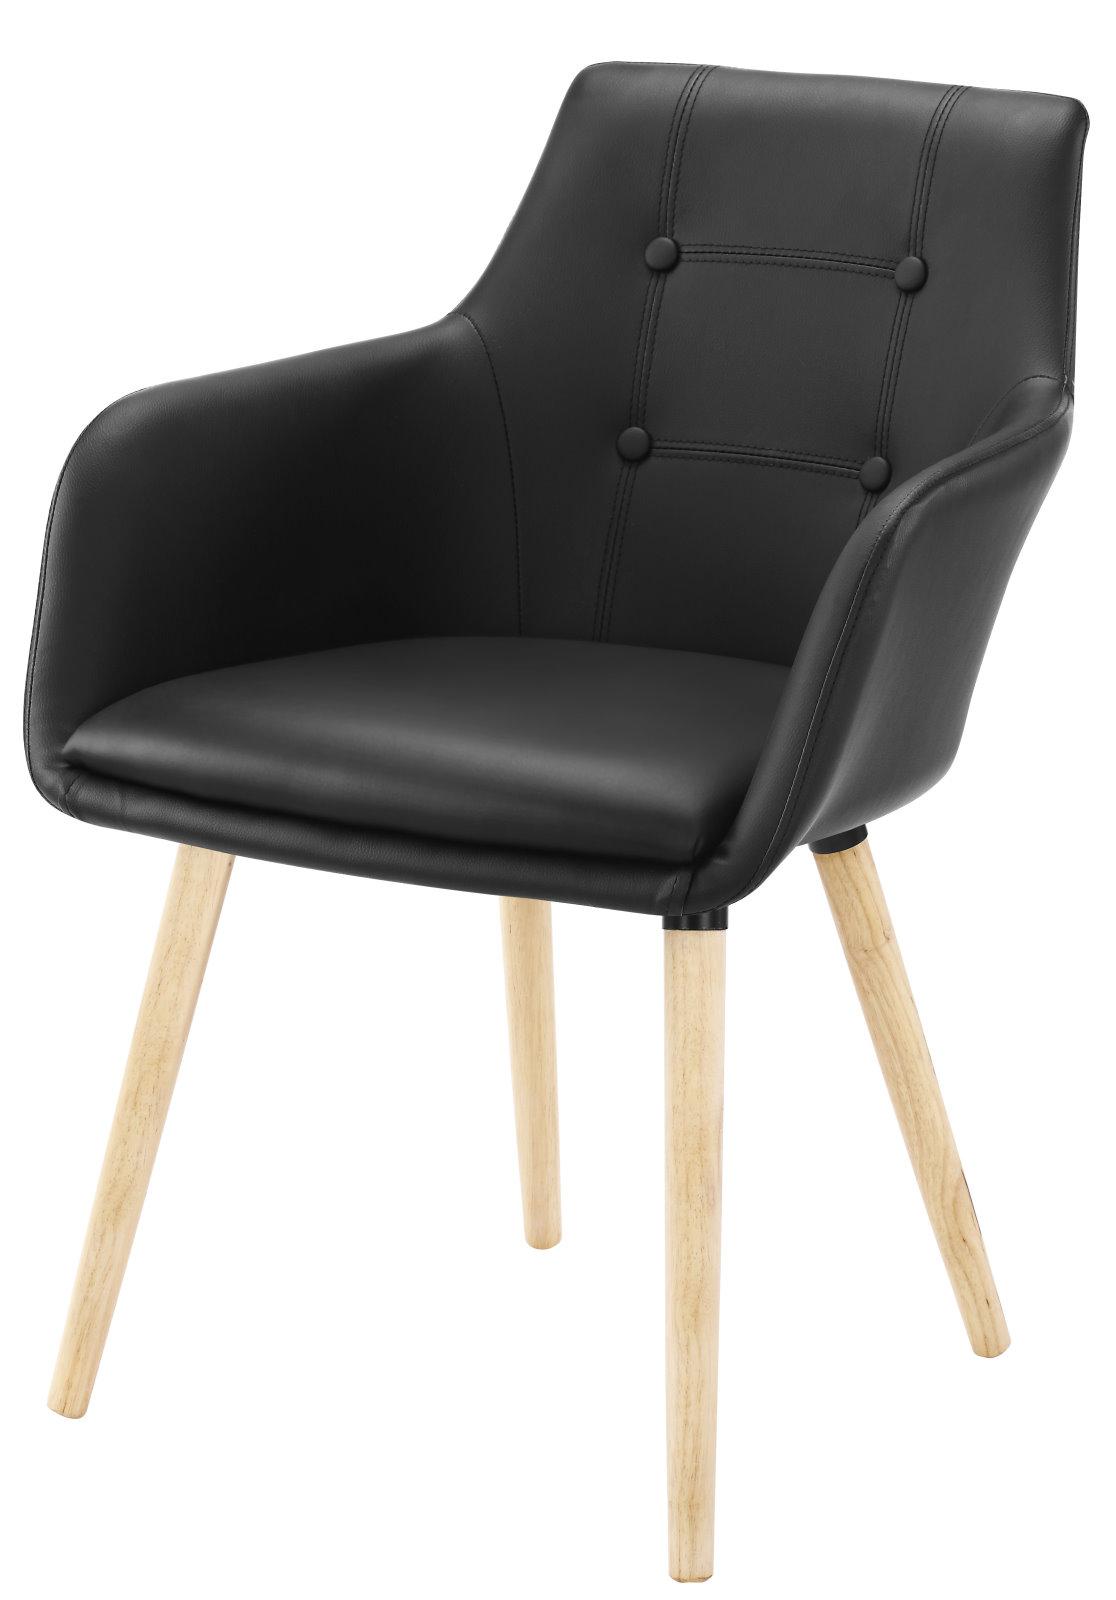 2x esszimmerstuhl john schwarz esszimmerst hle retro stuhl. Black Bedroom Furniture Sets. Home Design Ideas